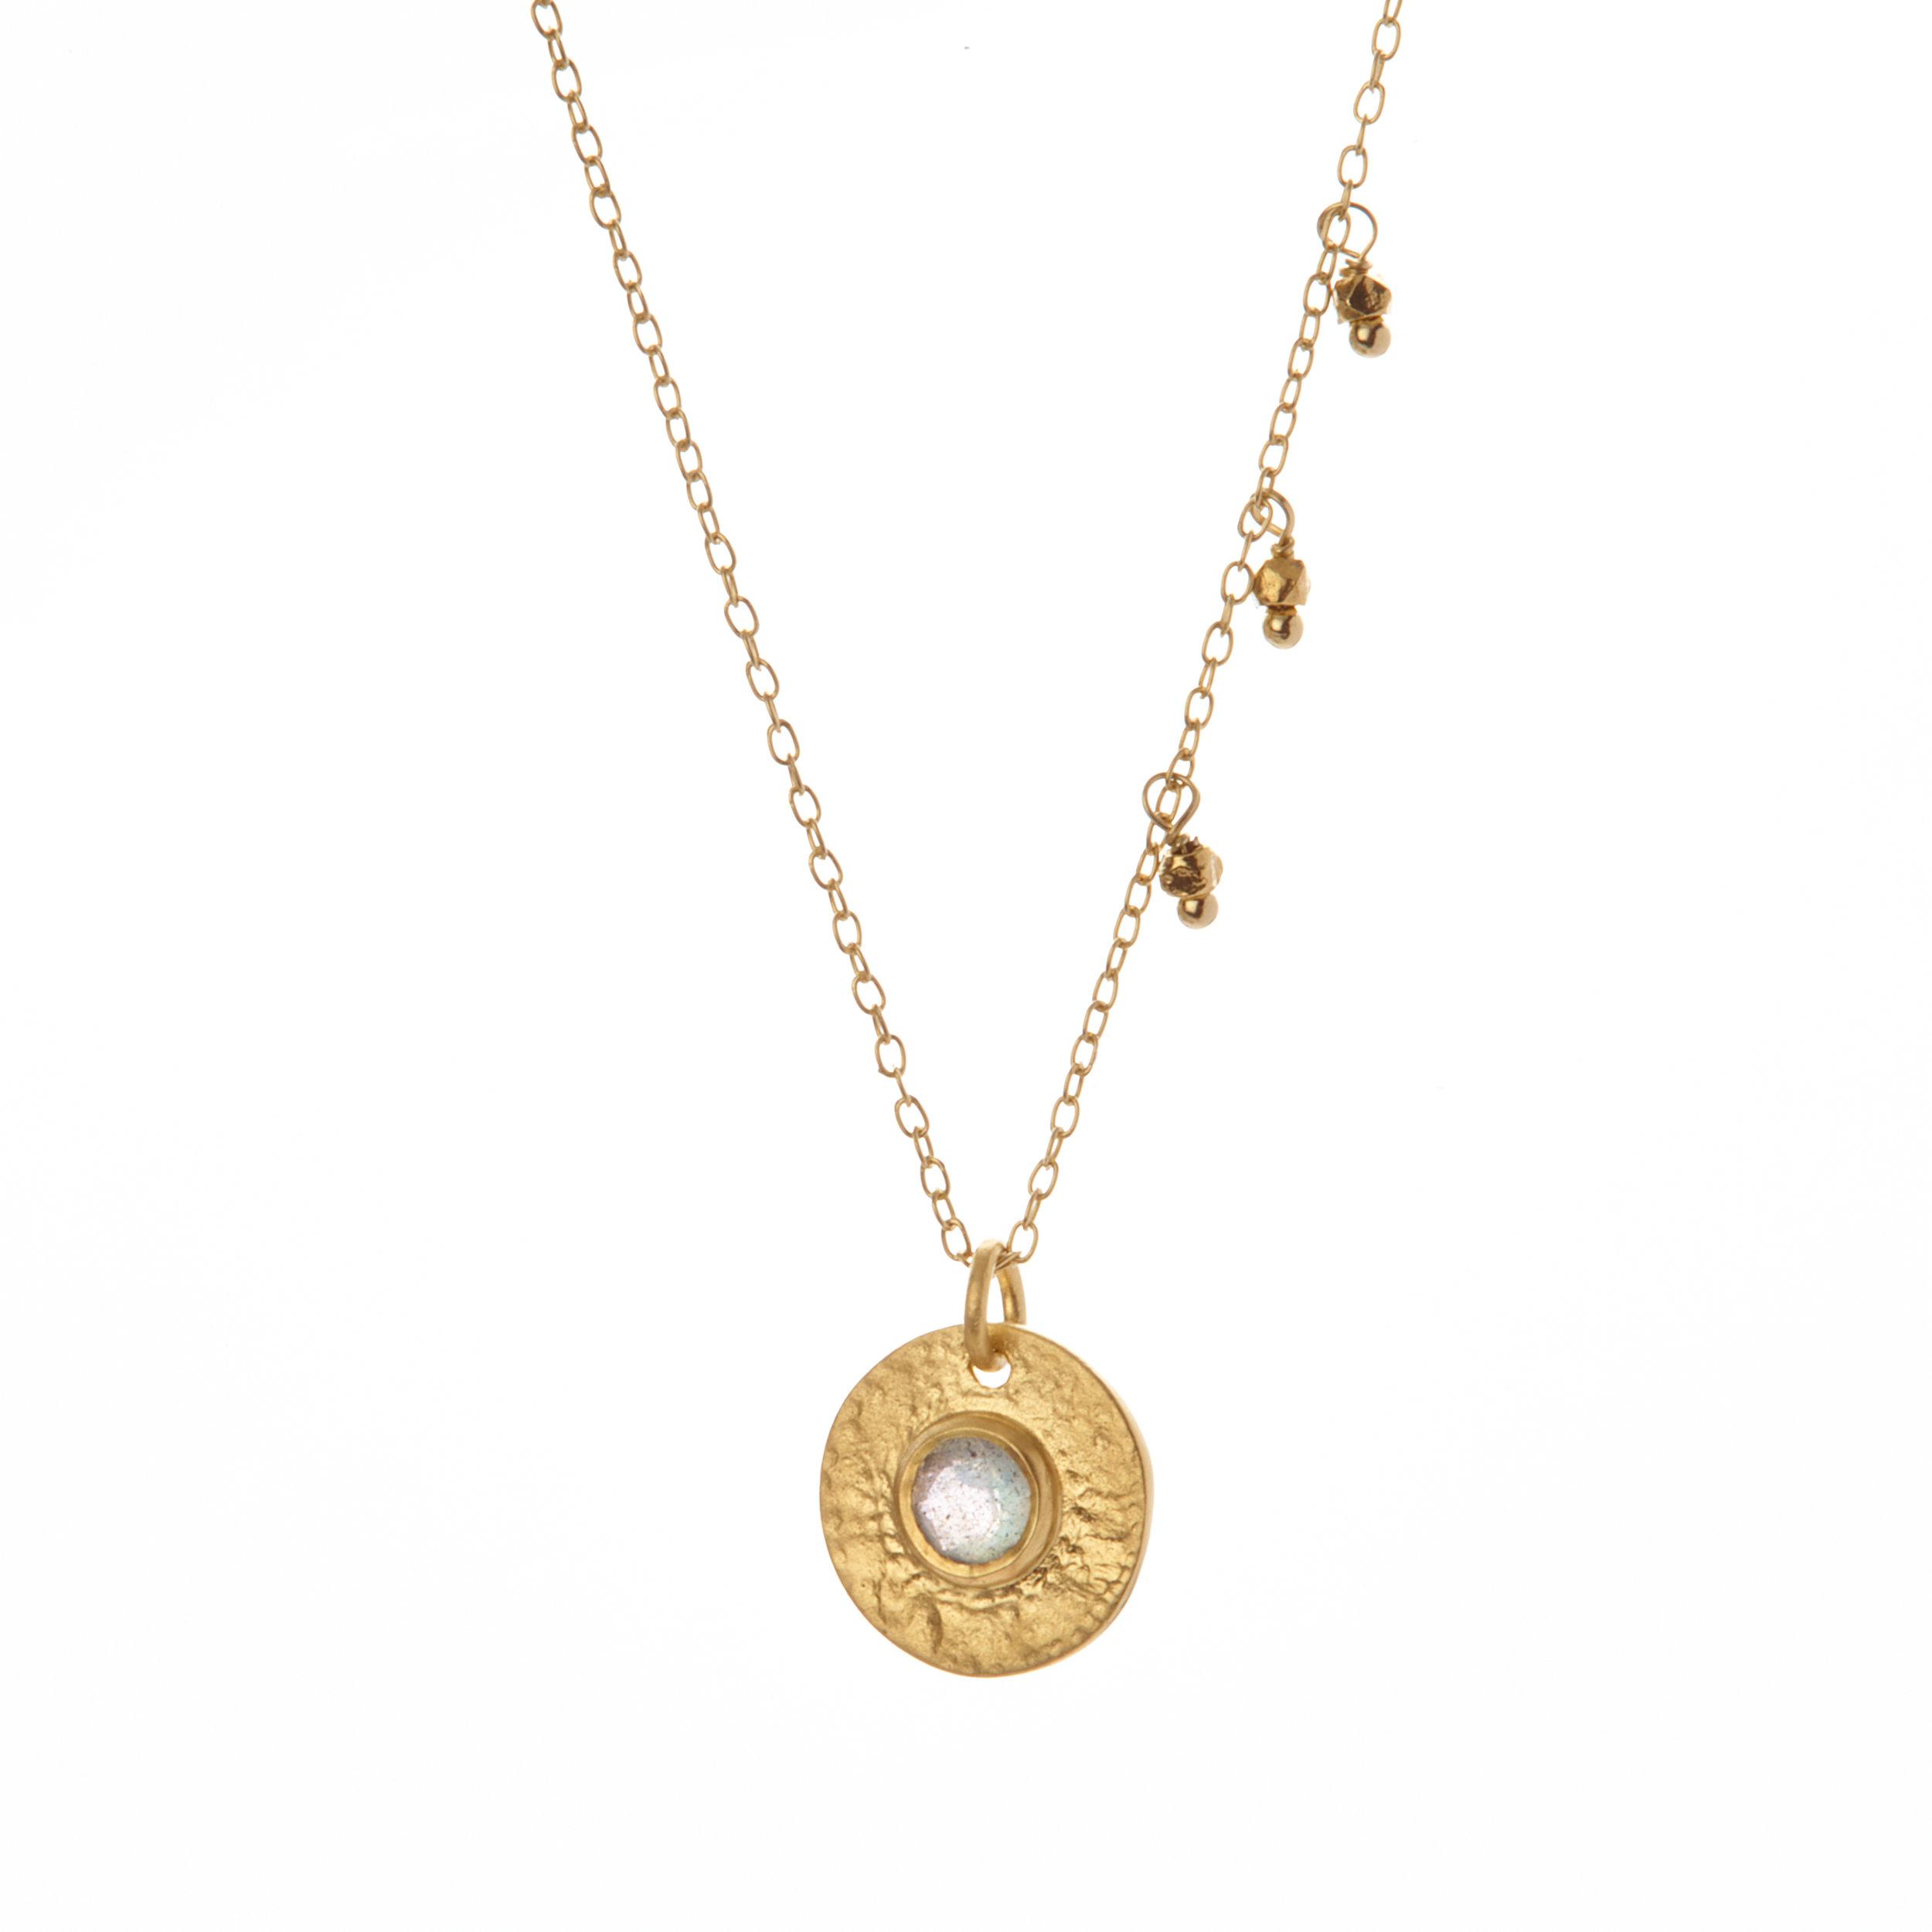 gilded labradorite Necklace